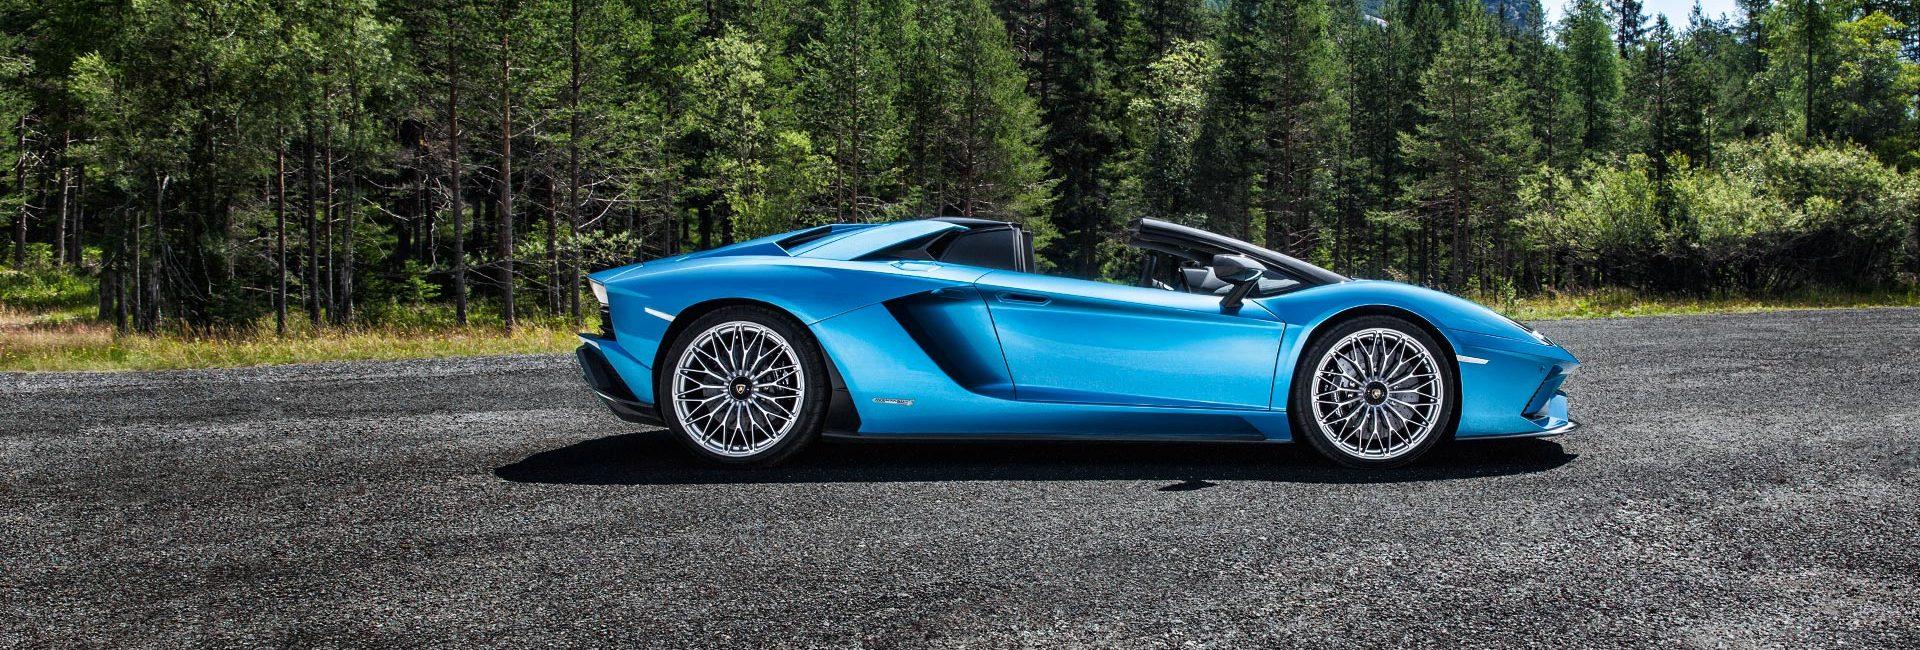 New Lamborghini Aventador S Roadster Bristol Rybrook